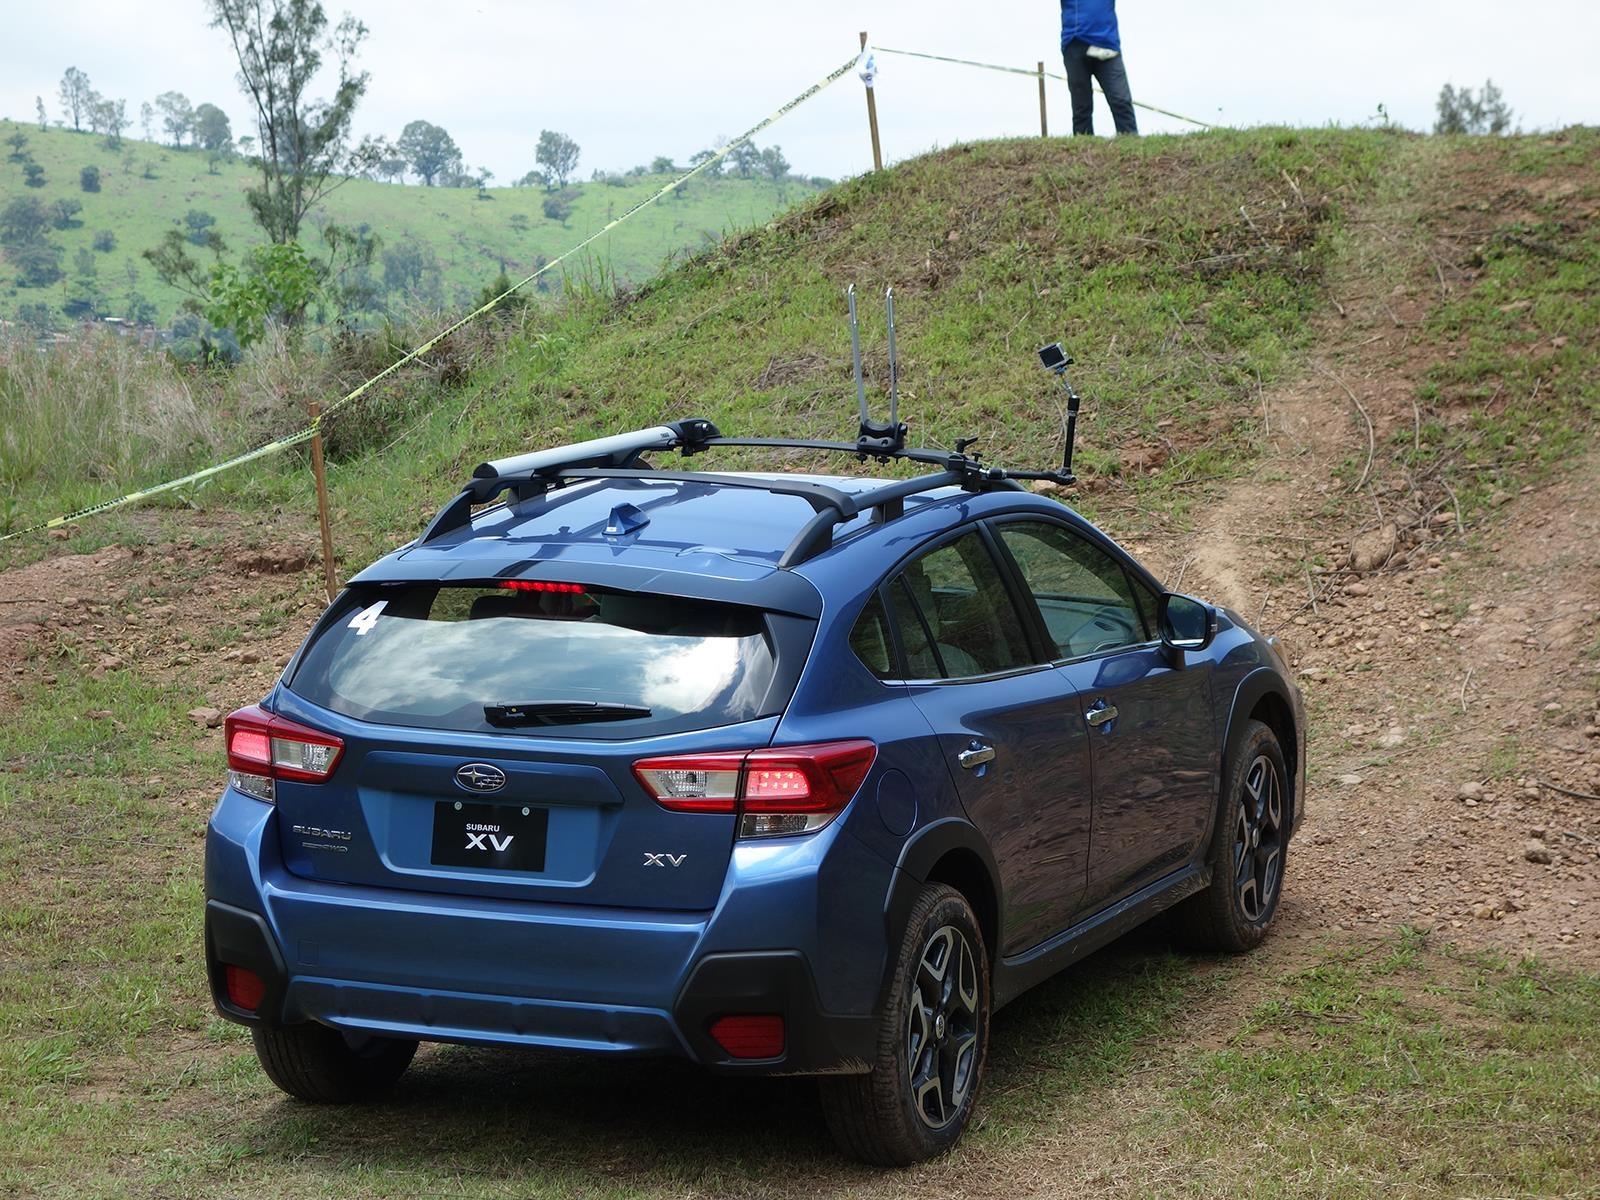 Subaru Xv 2018 Llega A M 233 Xico Desde 368 900 Pesos